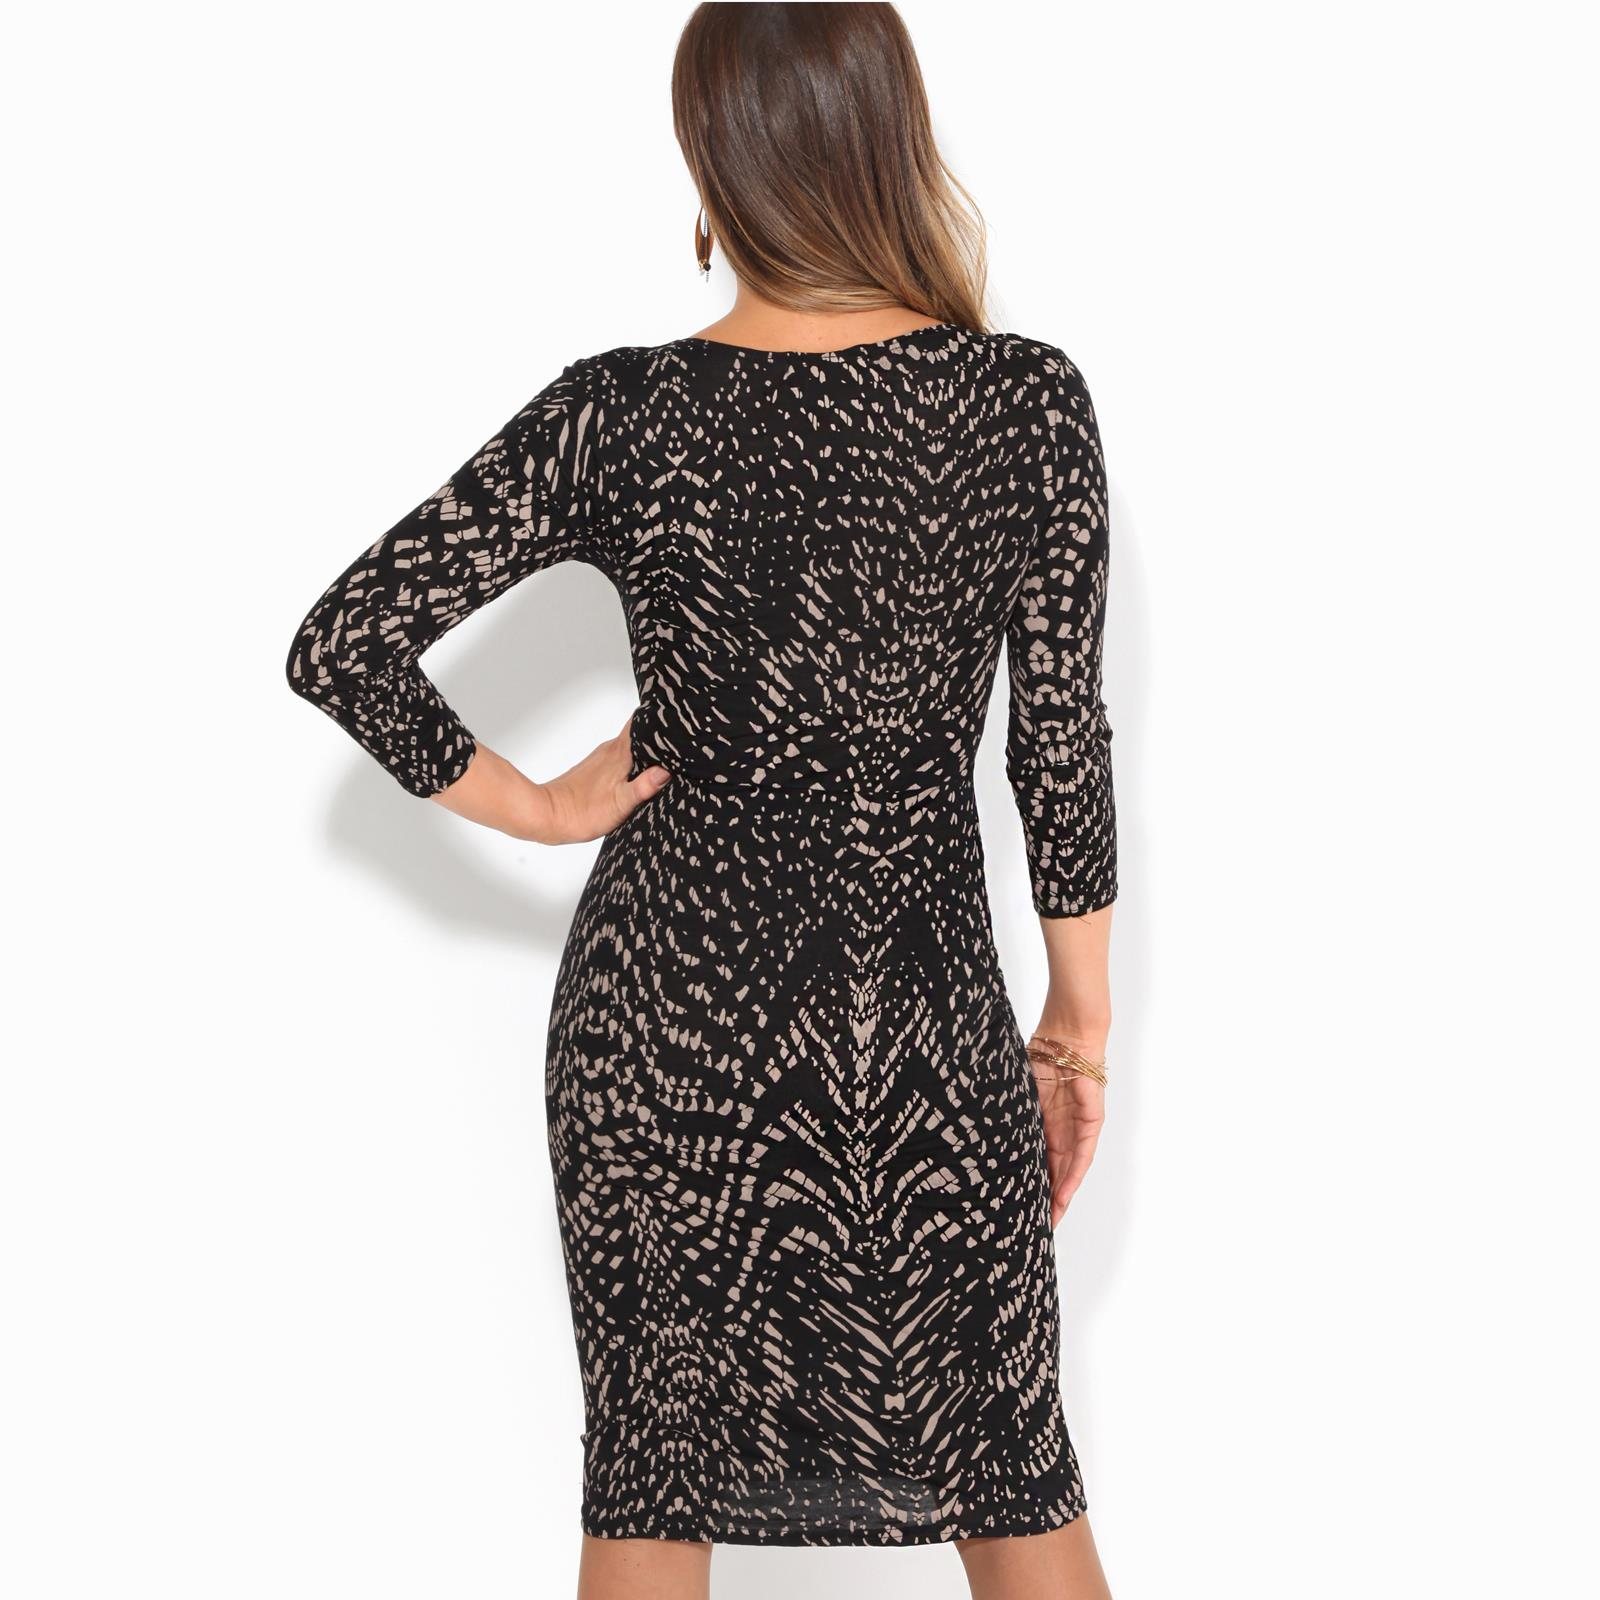 Womens-V-Neck-Dress-Top-Bodycon-Skirt-Midi-Snakeskin-Print-Cross-Over-Party-Wrap thumbnail 13